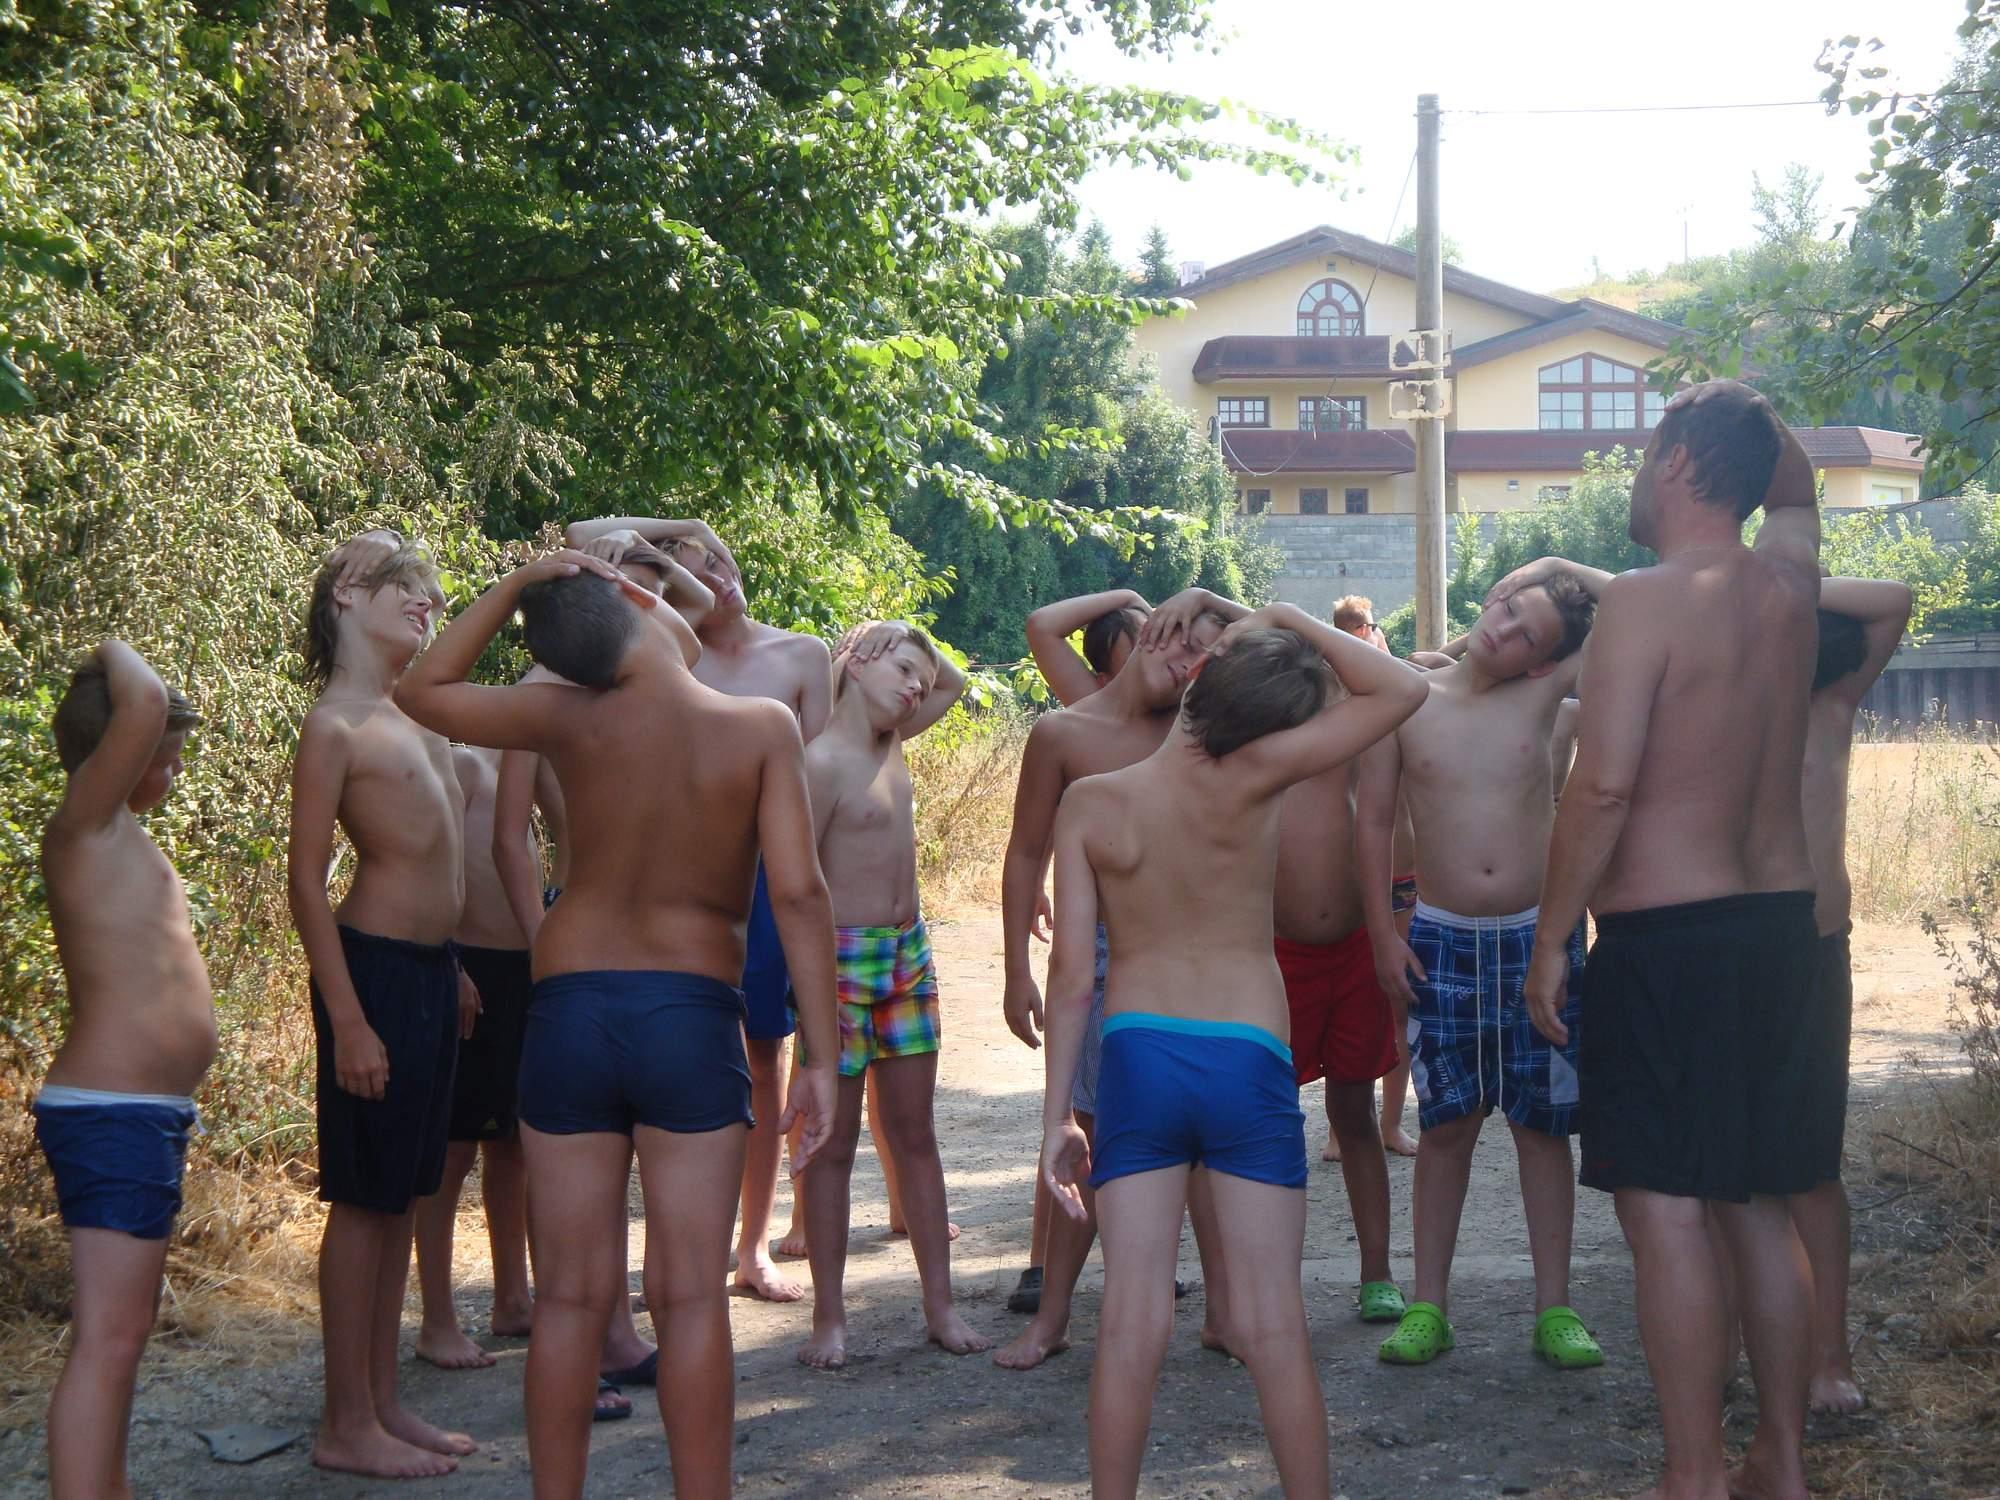 rajce idnes cz boys Rajce Idnes Cz Nude Hot Girls Wallpaper